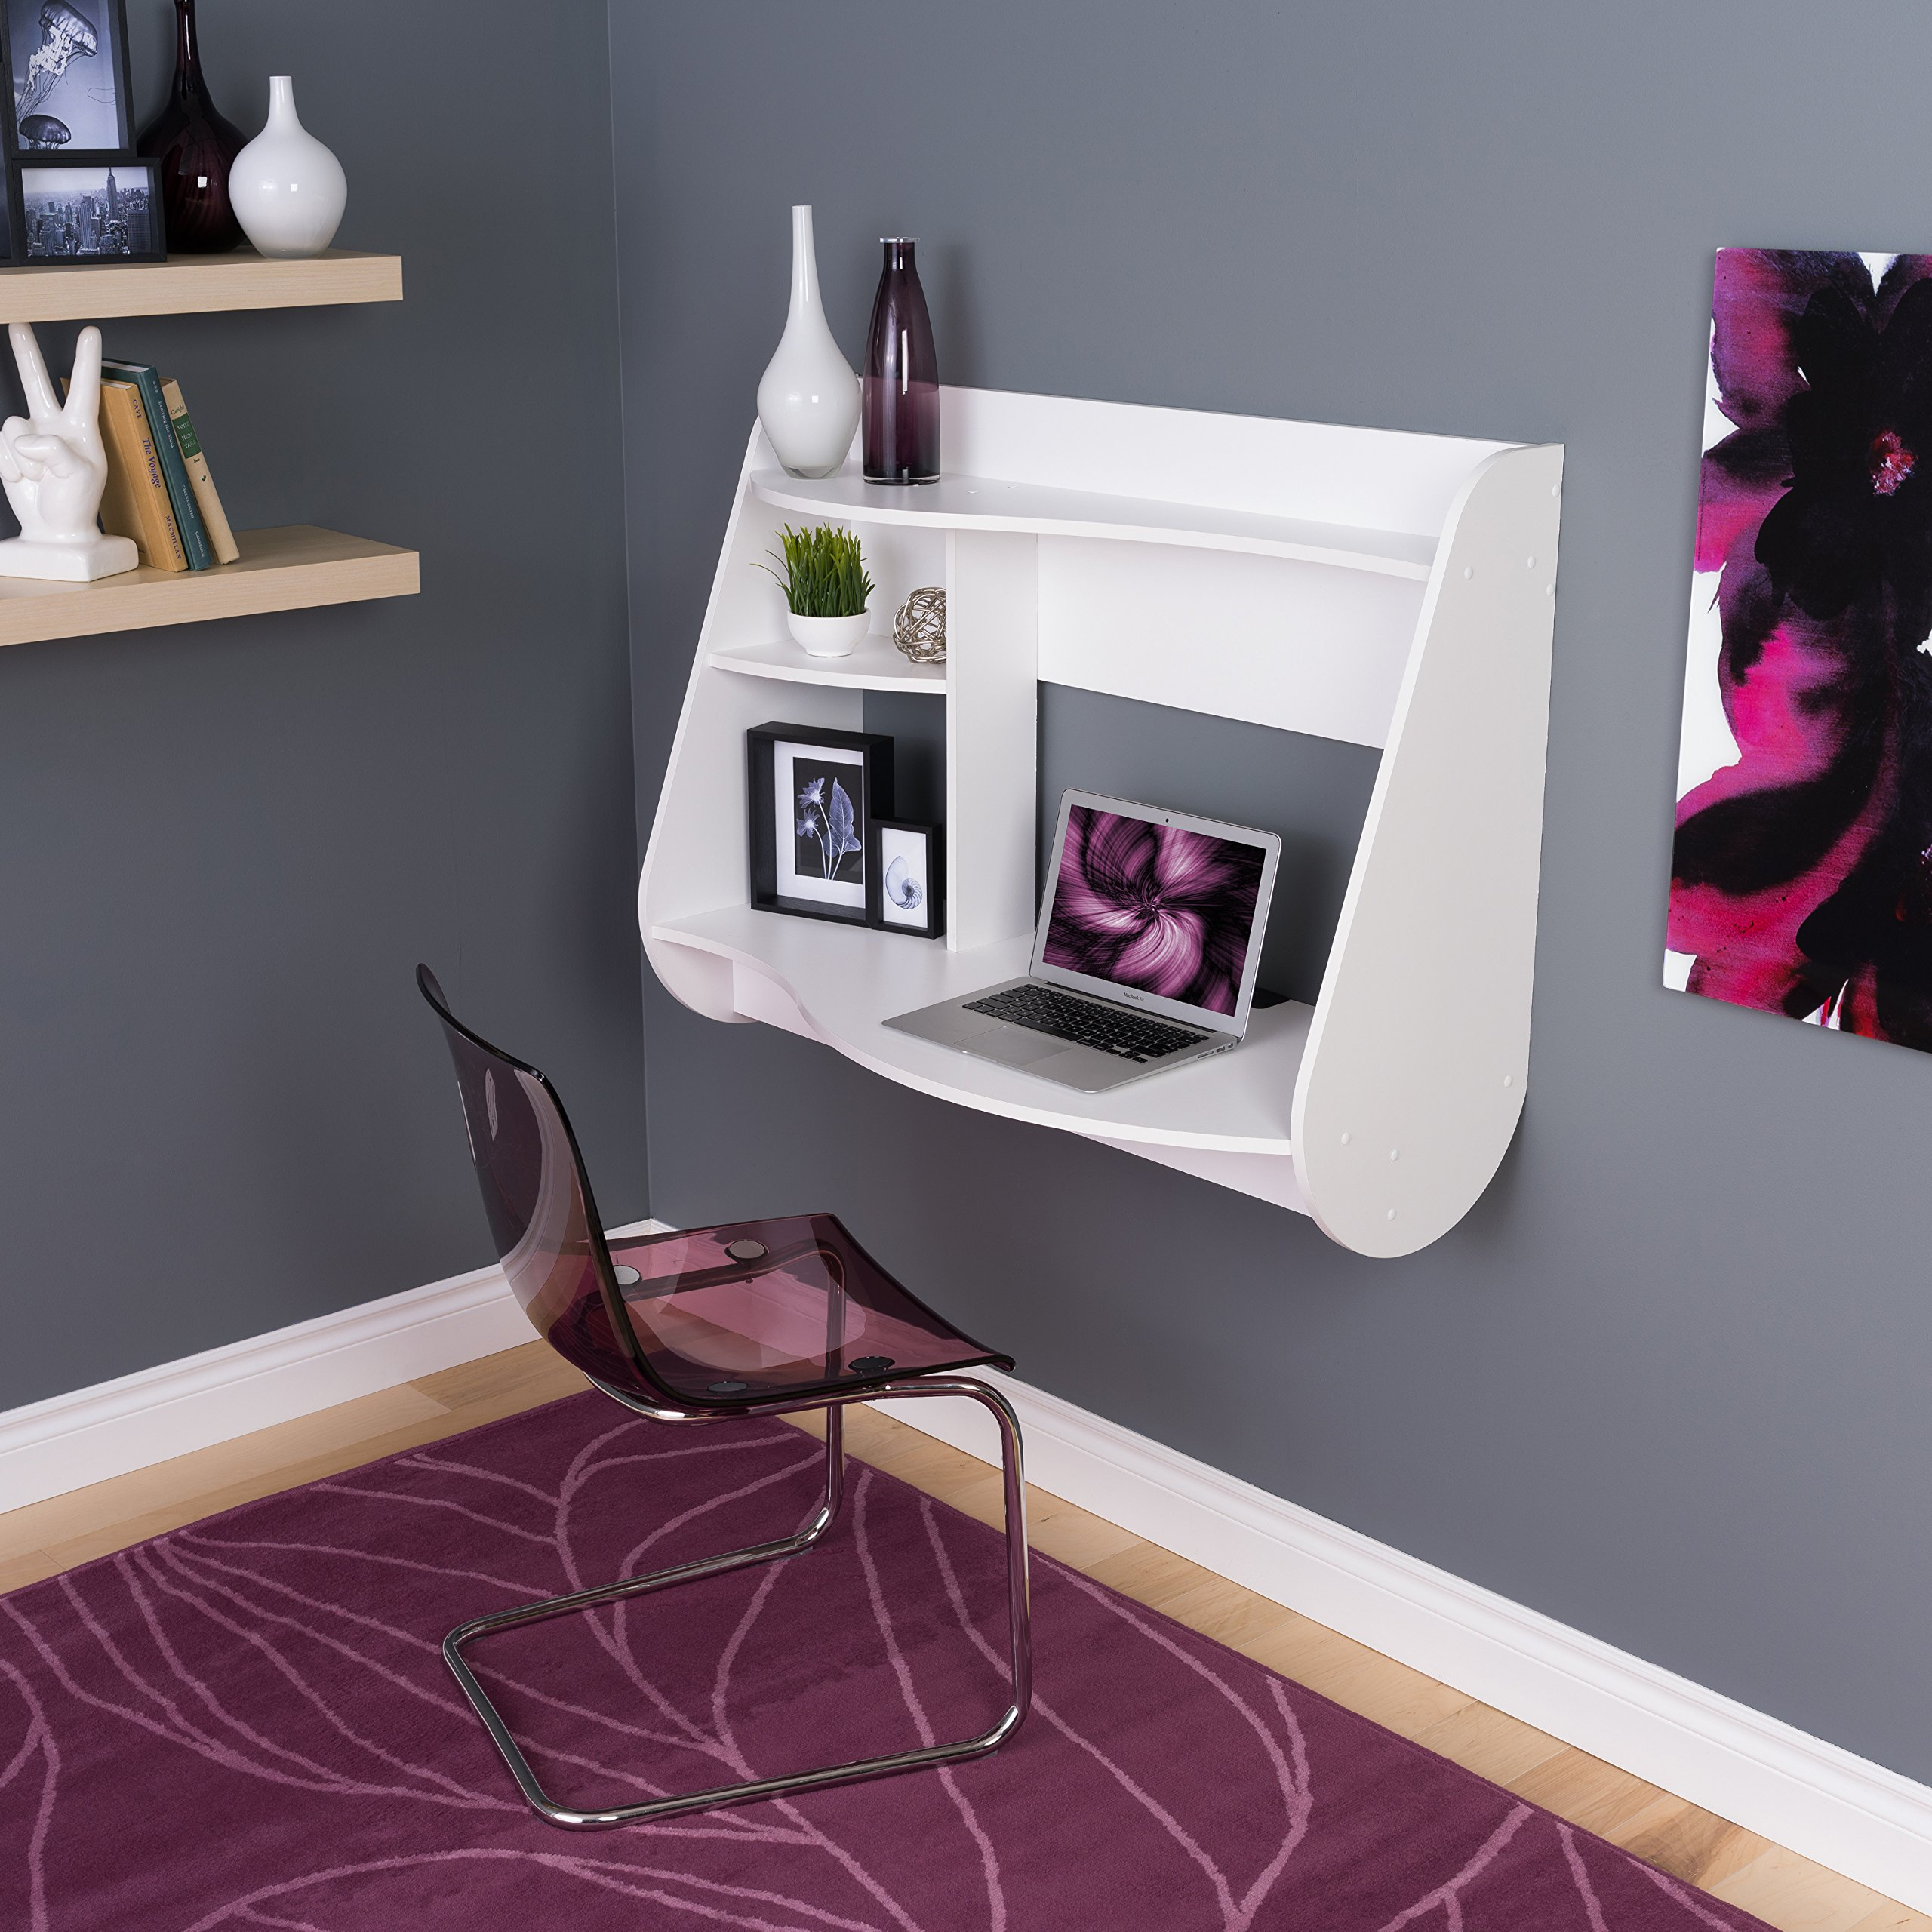 Prepac Kurv Floating Desk, White by Prepac